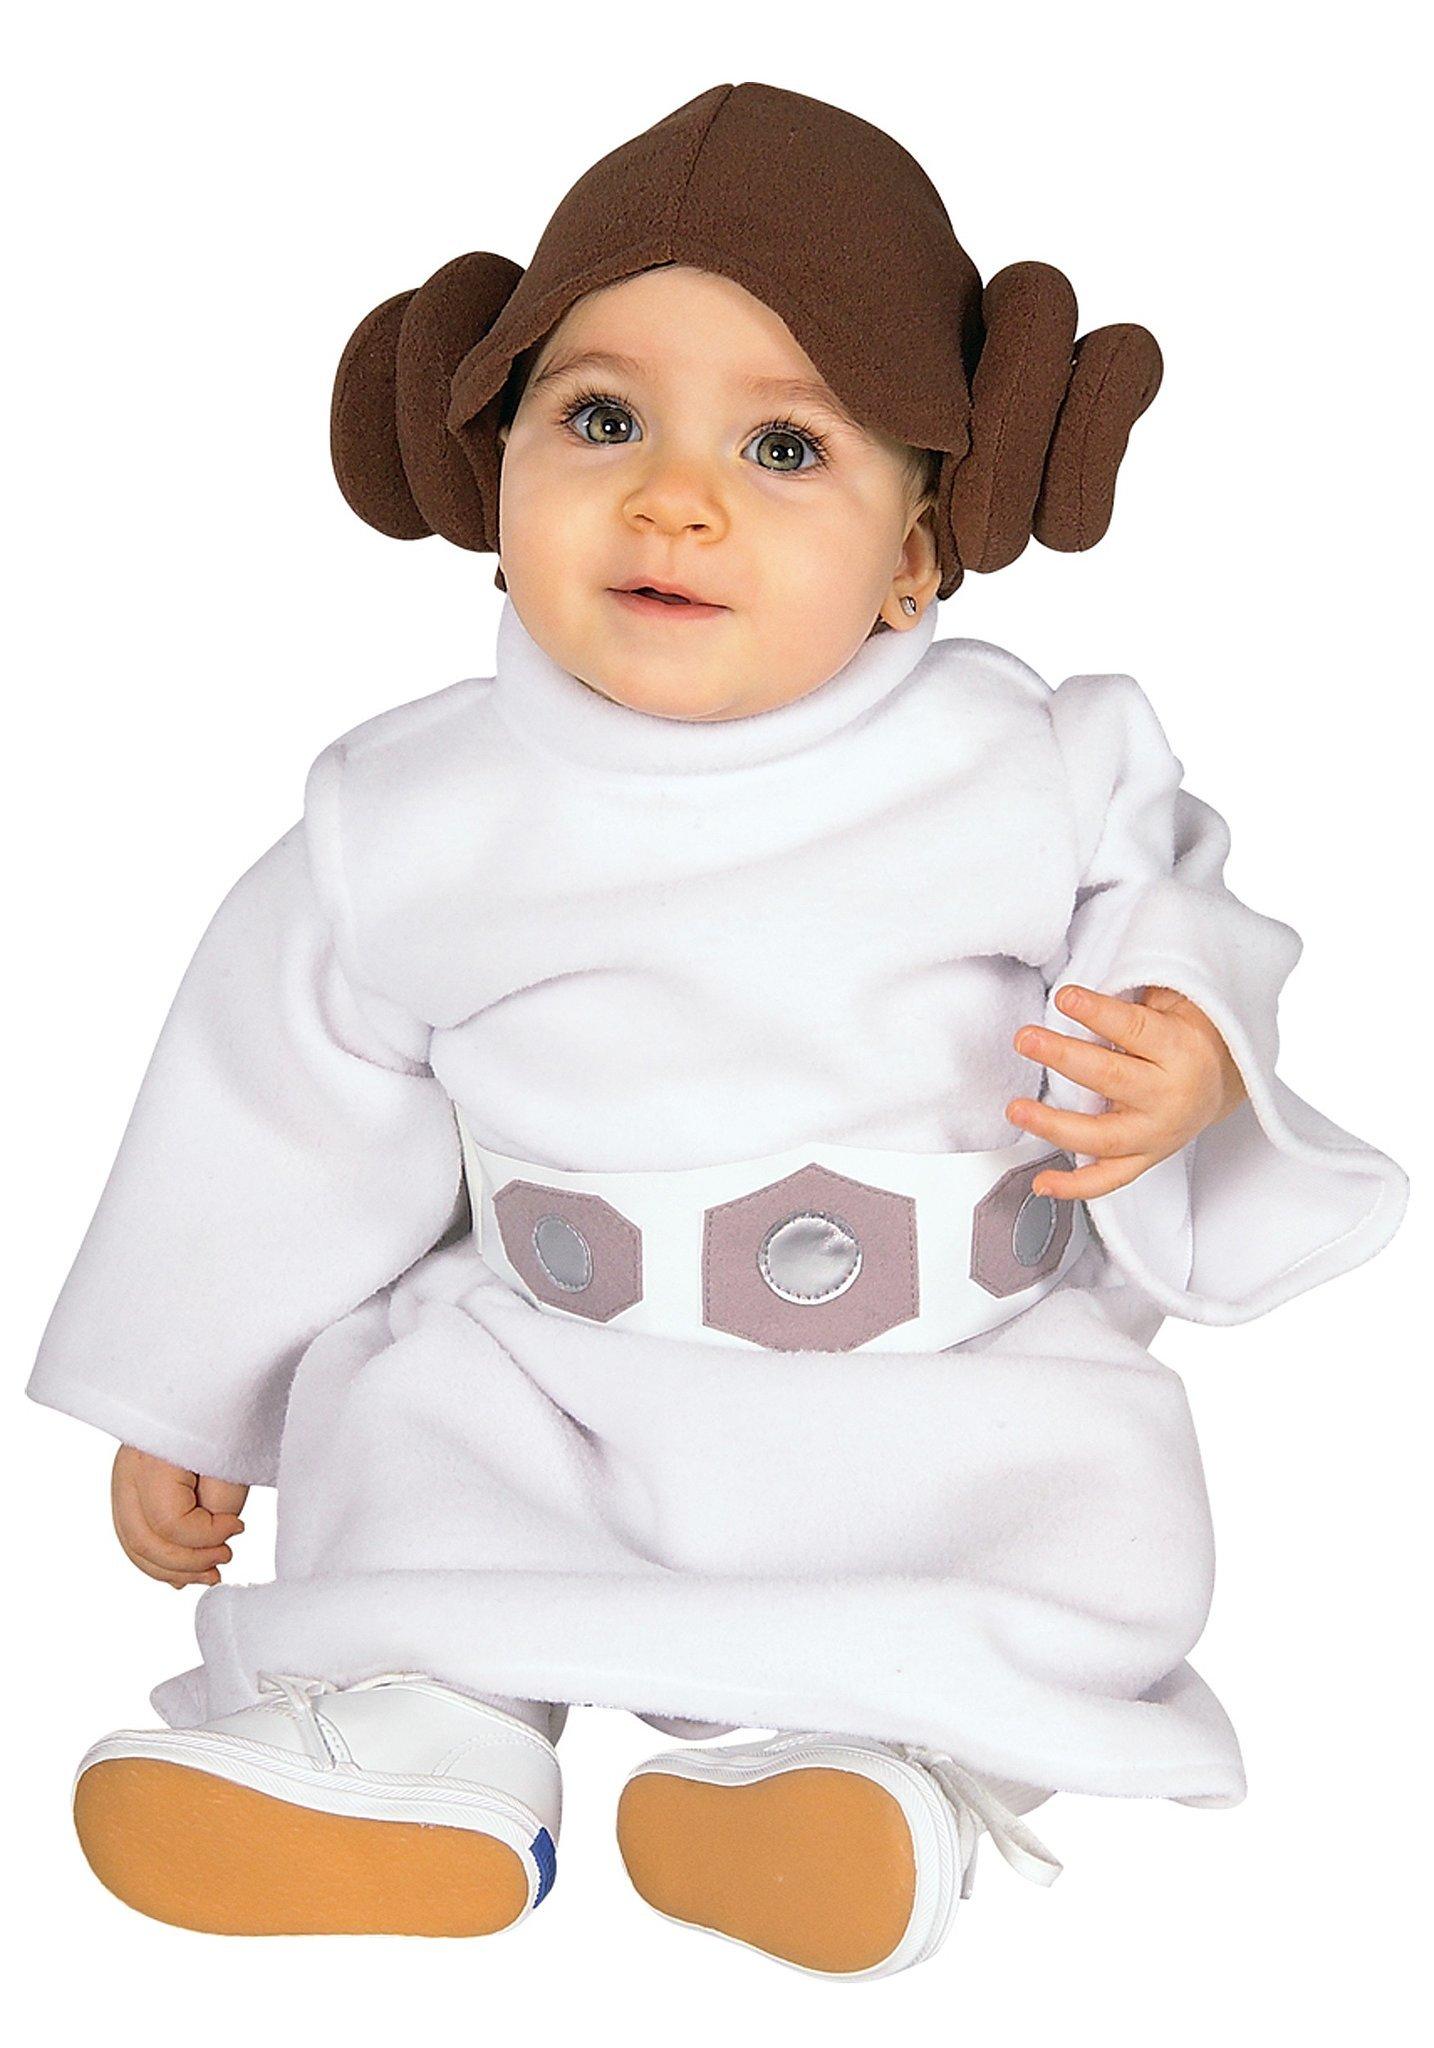 princess leia baby 39 s first halloween 26 cute costume ideas popsugar moms. Black Bedroom Furniture Sets. Home Design Ideas